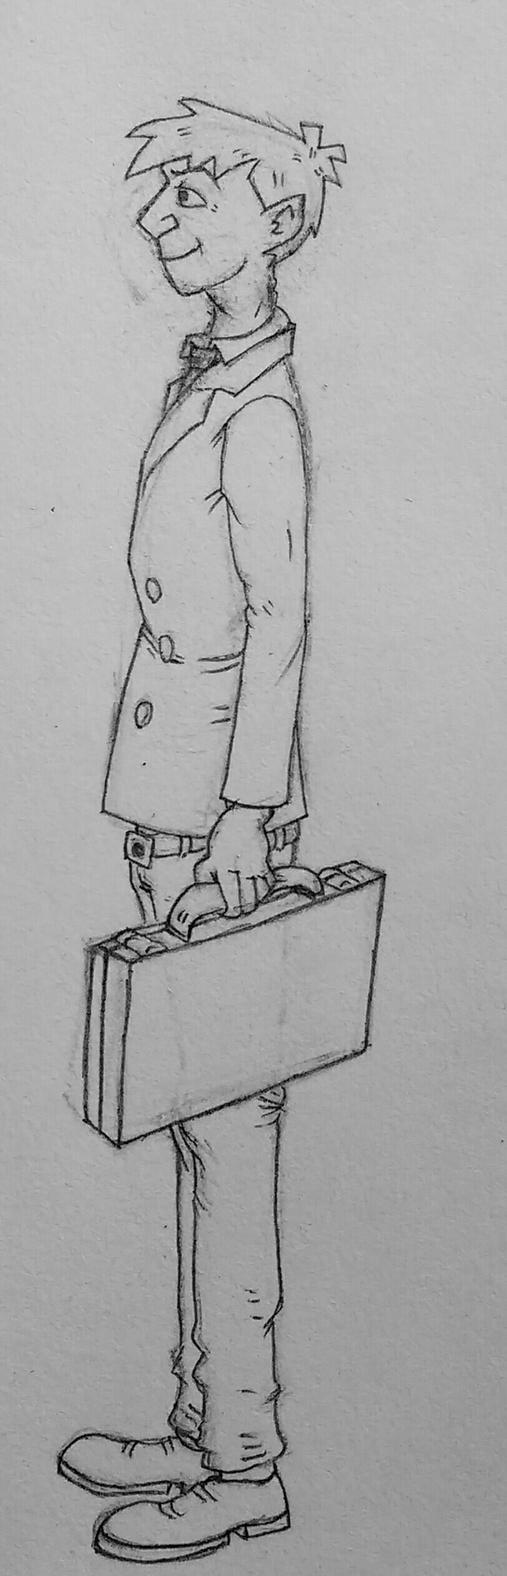 Professor Crane by CheshyFreshy